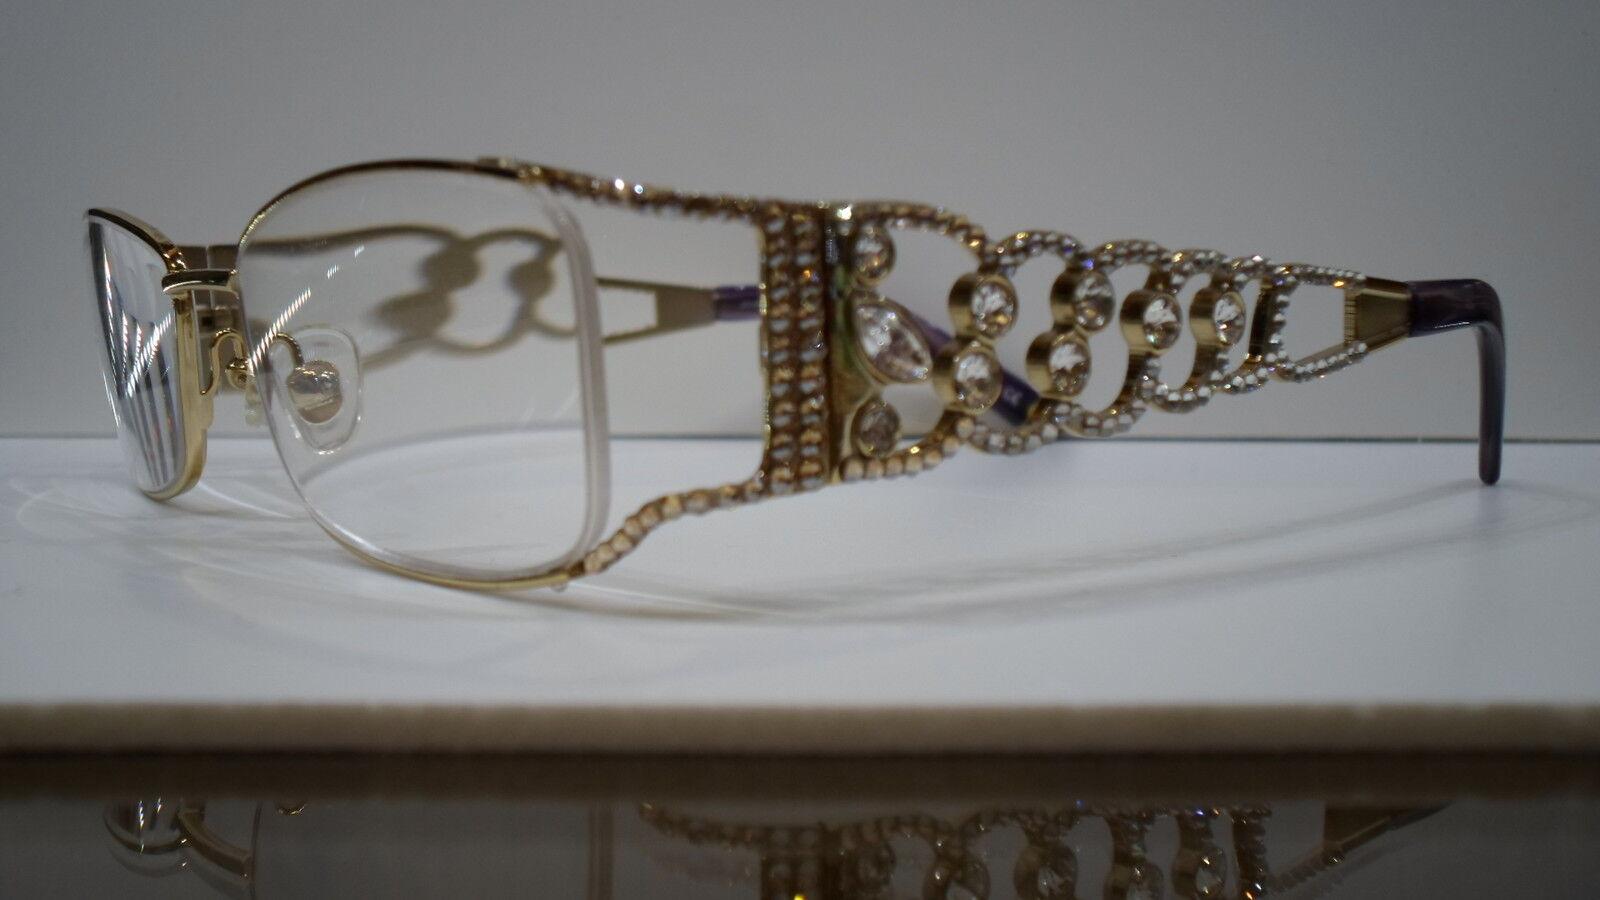 The Spectacle Maker Ltd